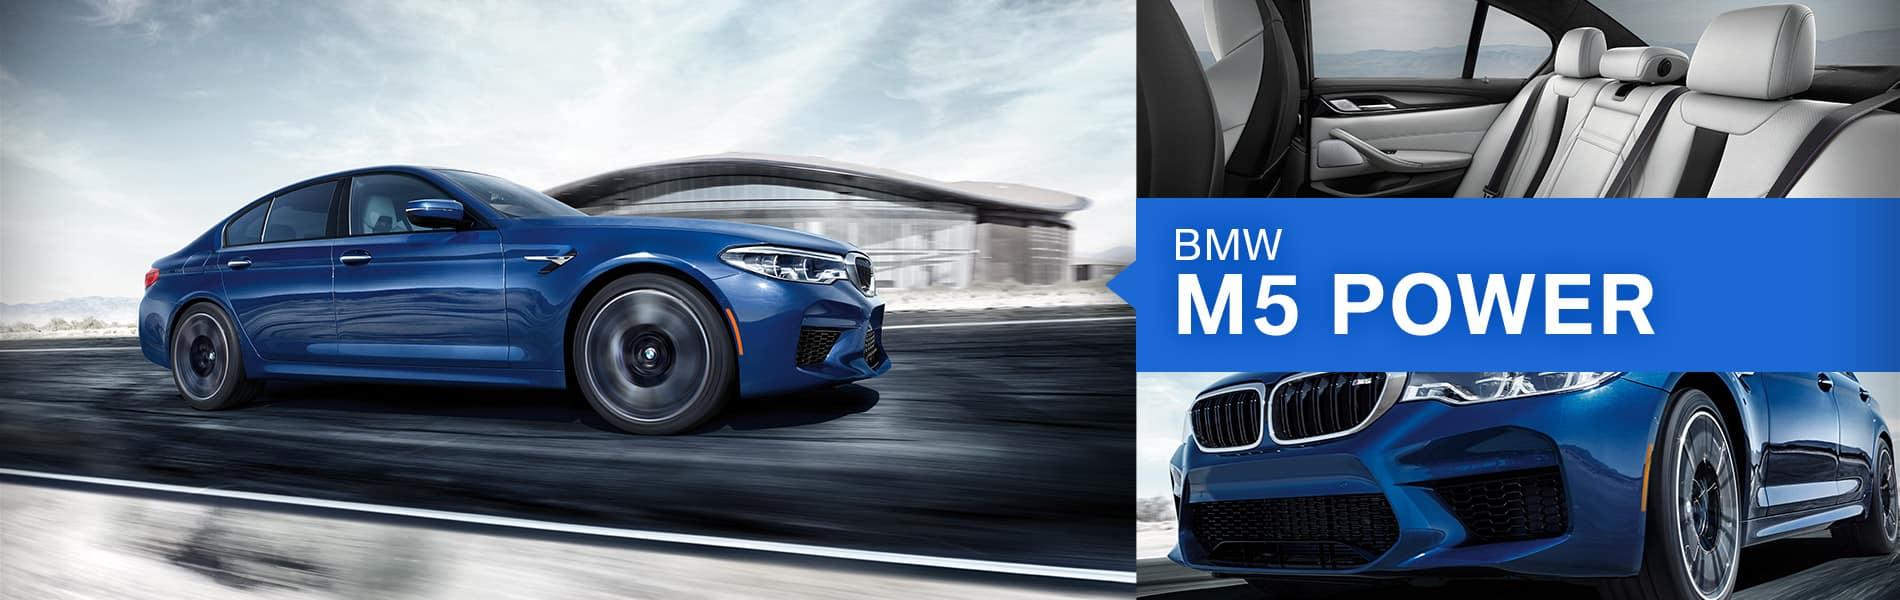 2019 BMW M5 | Fort Wayne, IN